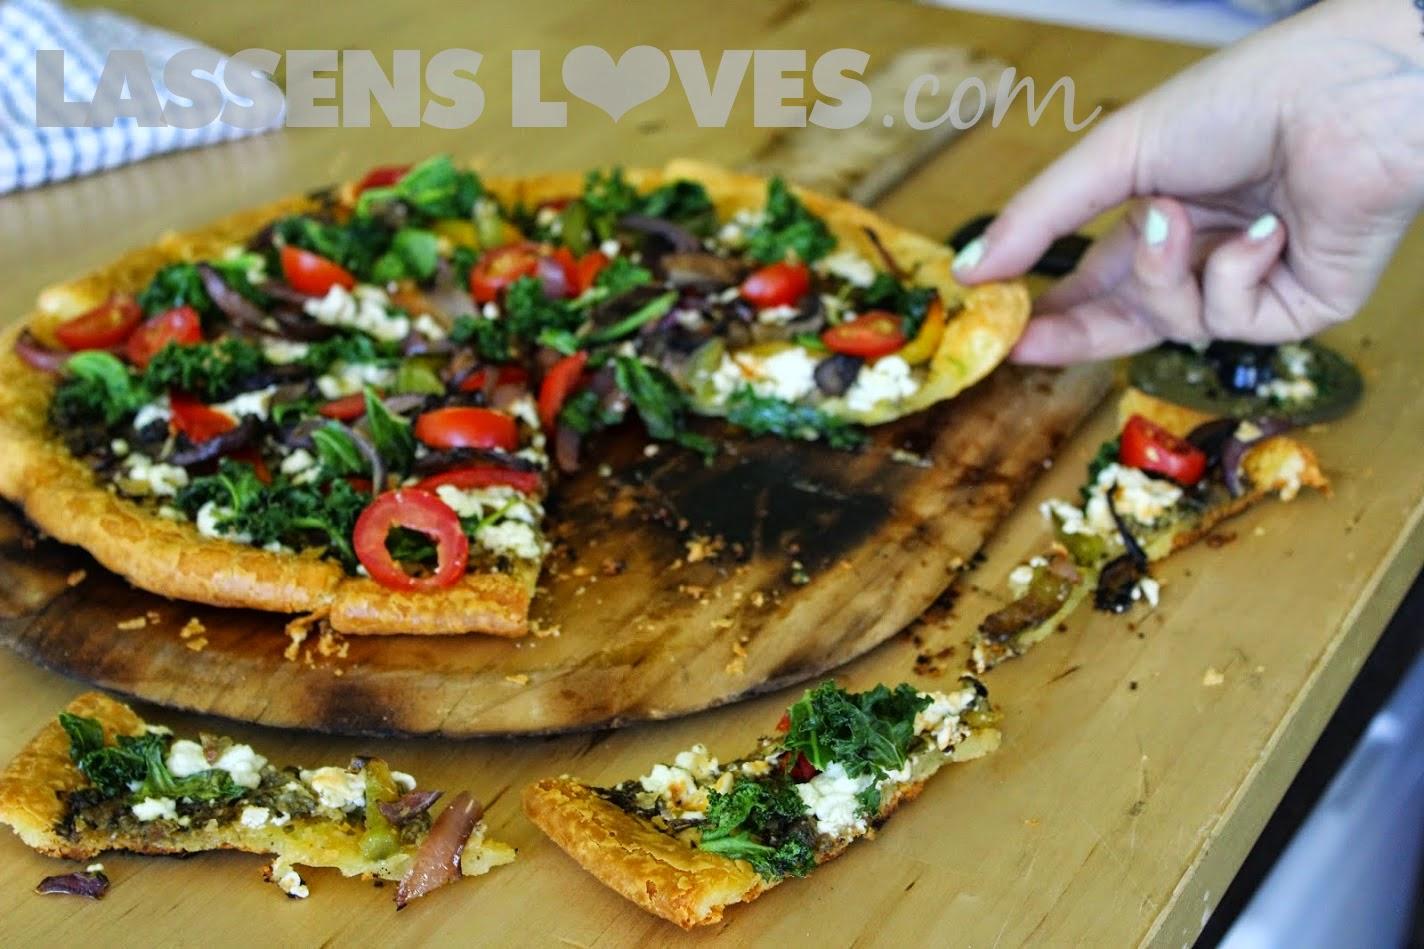 veggie+pizza, guilt+free+pizza, gluten+free+pizza, pizza+recipes